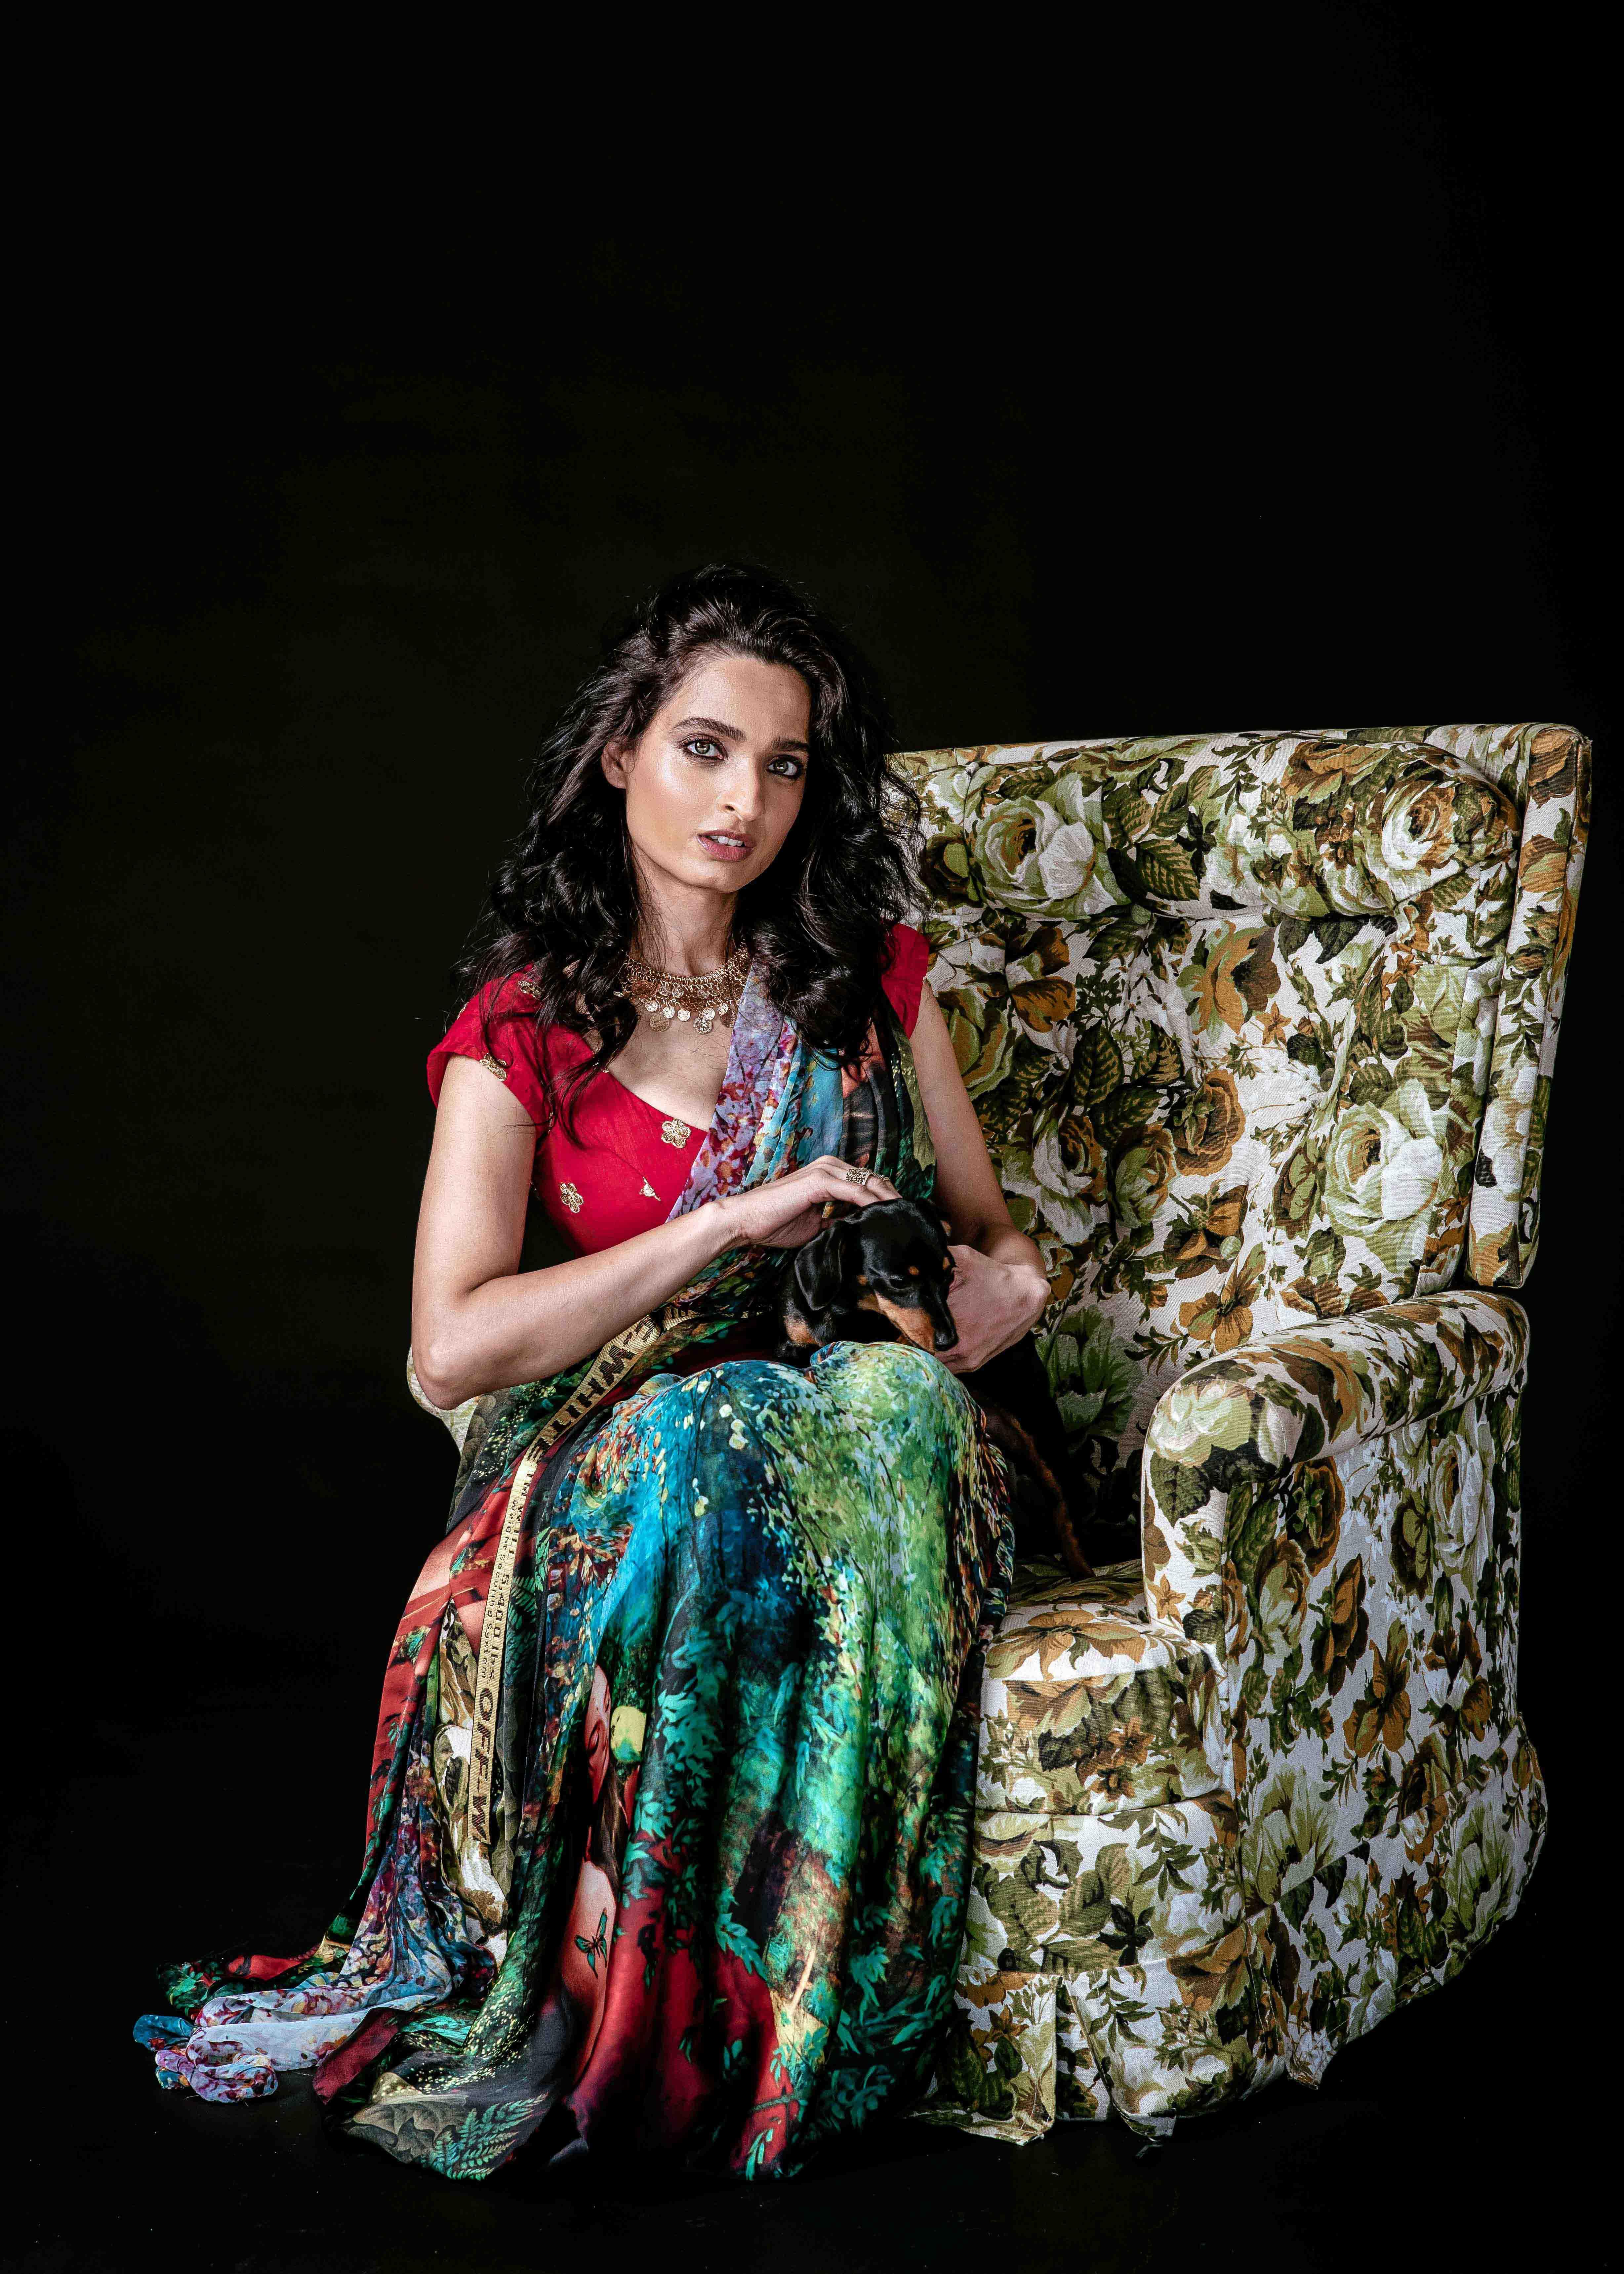 Green Saree sitting on floral chair with daschund sausage dog